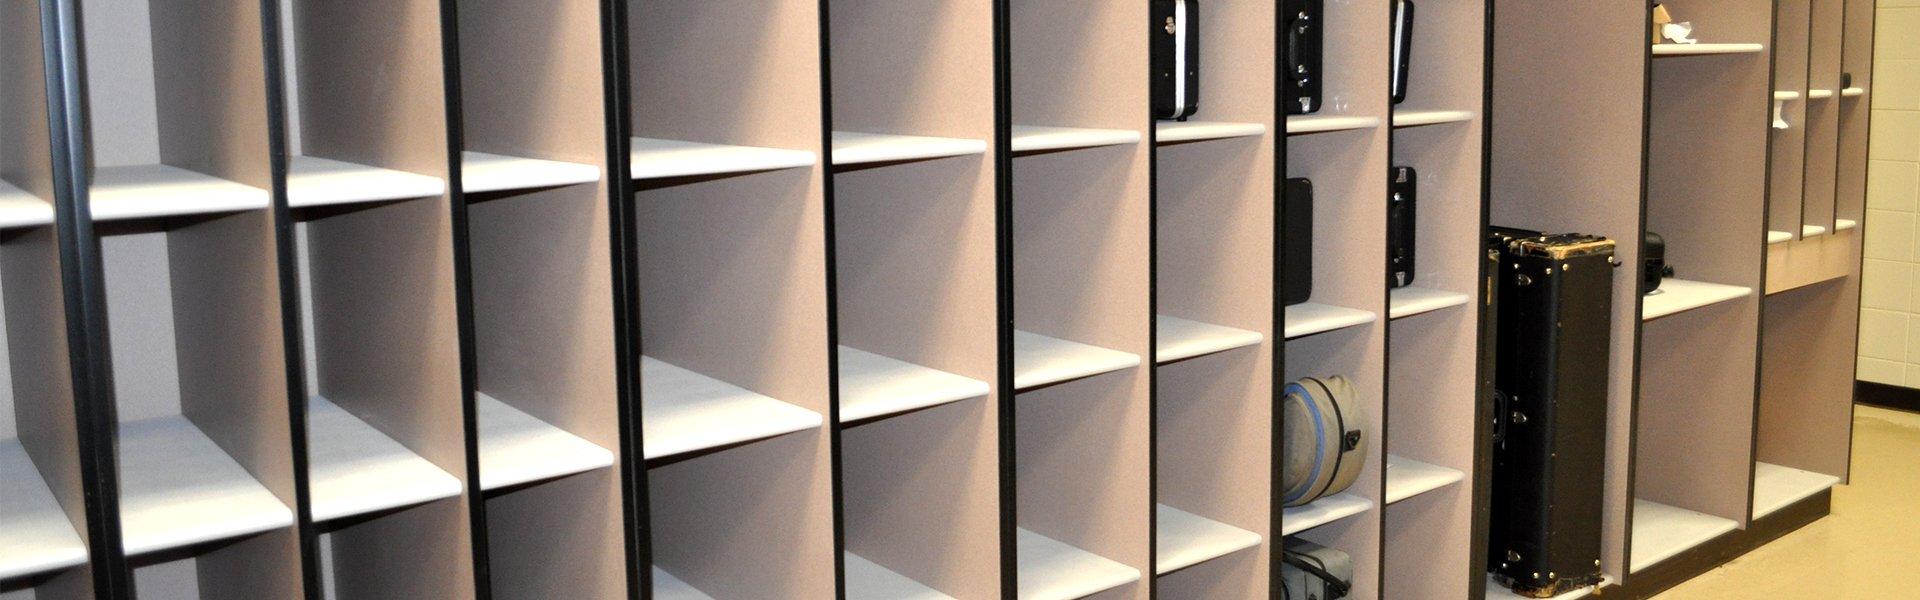 CFC Educational Music Storage Wall